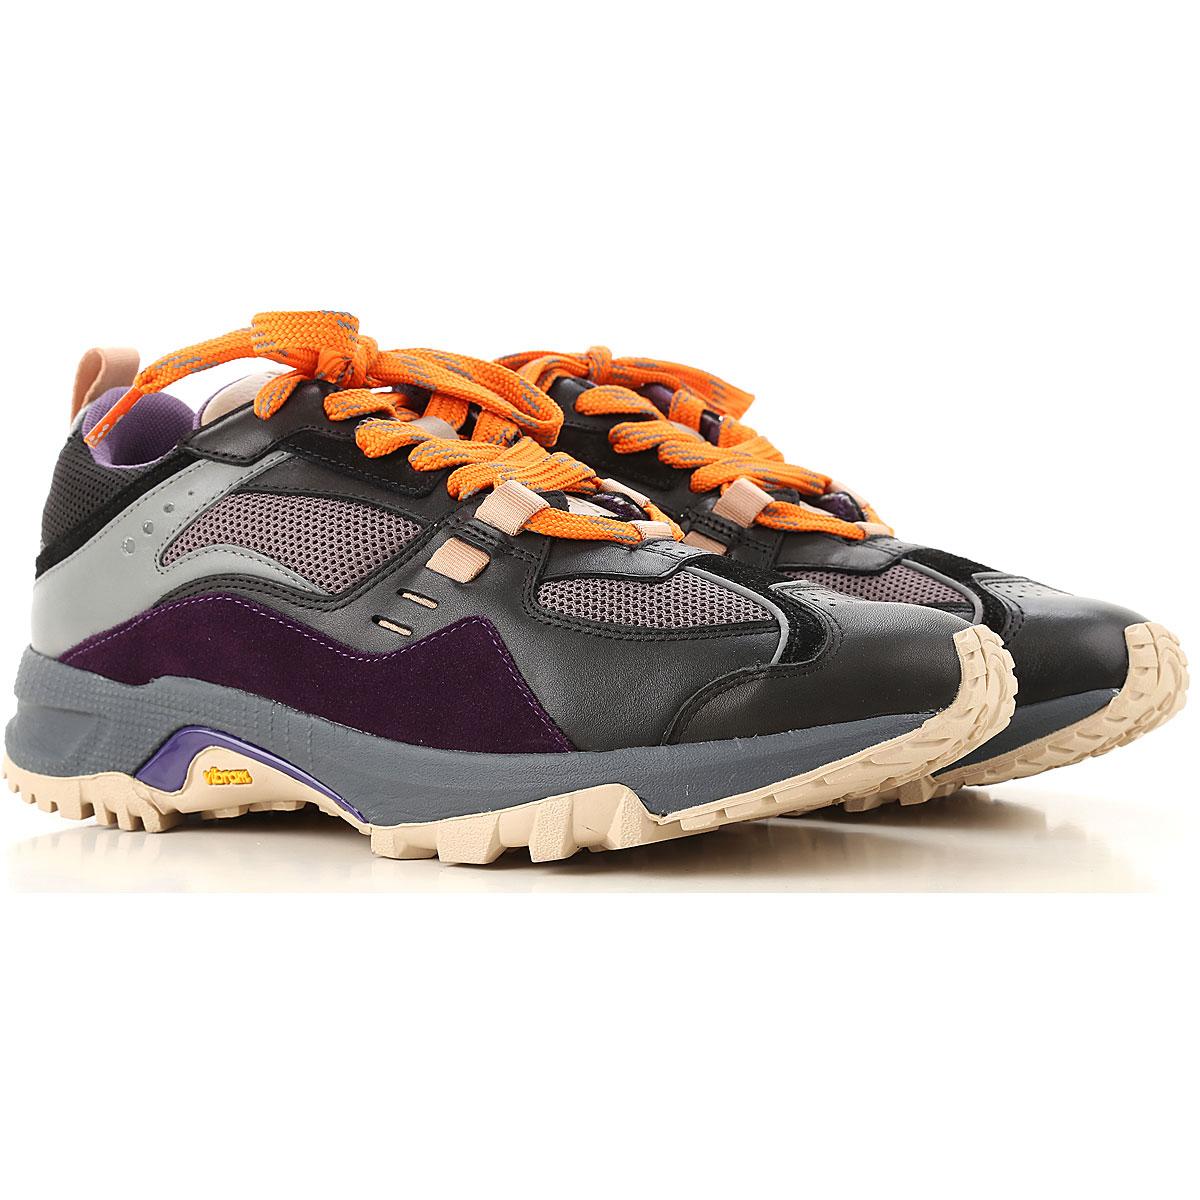 Marcelo Burlon Sneaker Homme, Prune Violet, Daim, 2019, 40 41 42 43 44